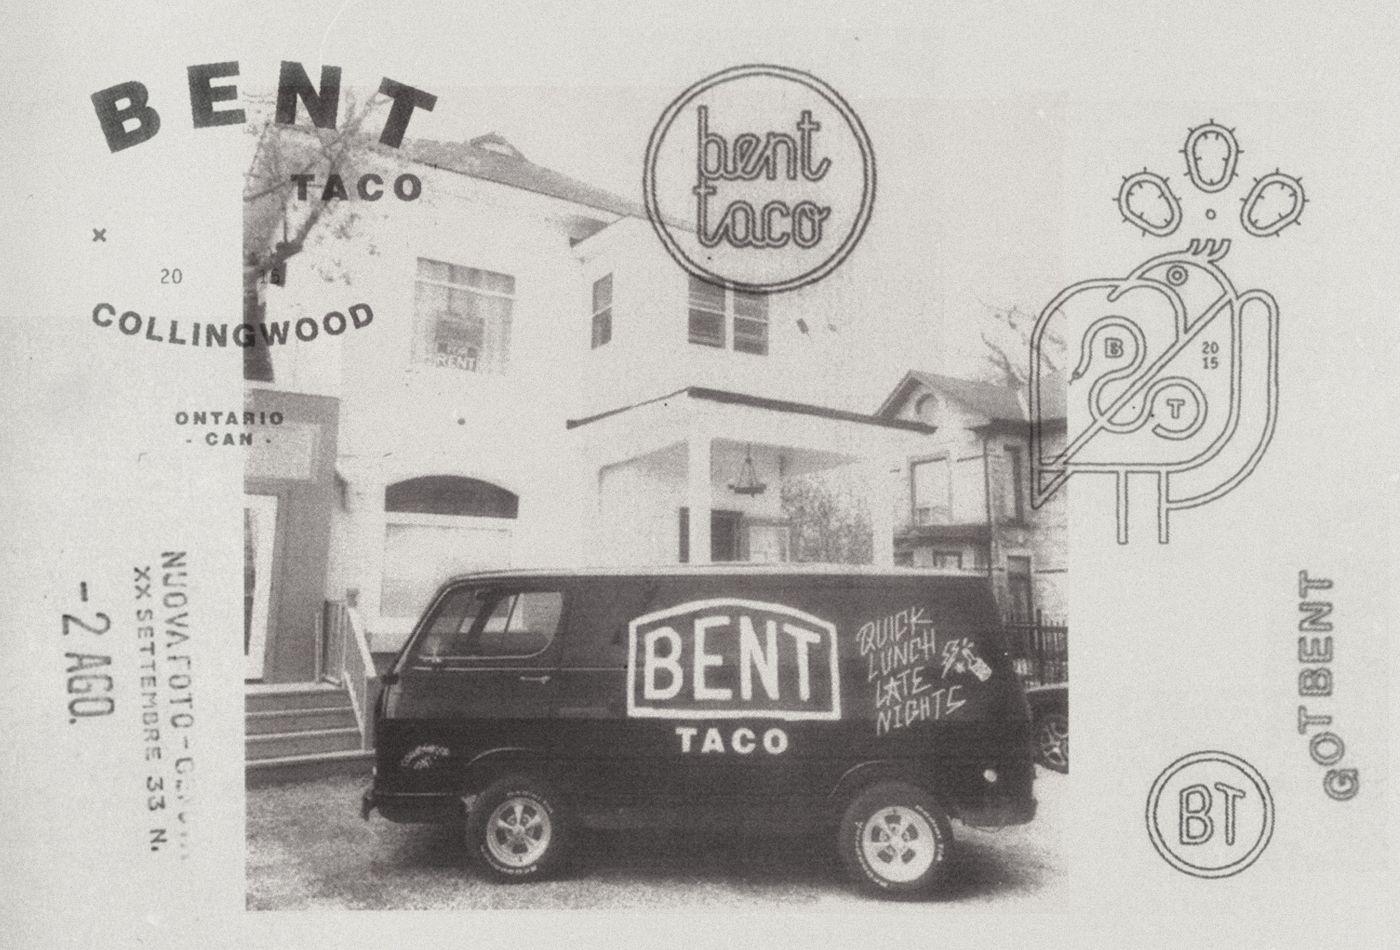 Bent Taco | vacaliebres